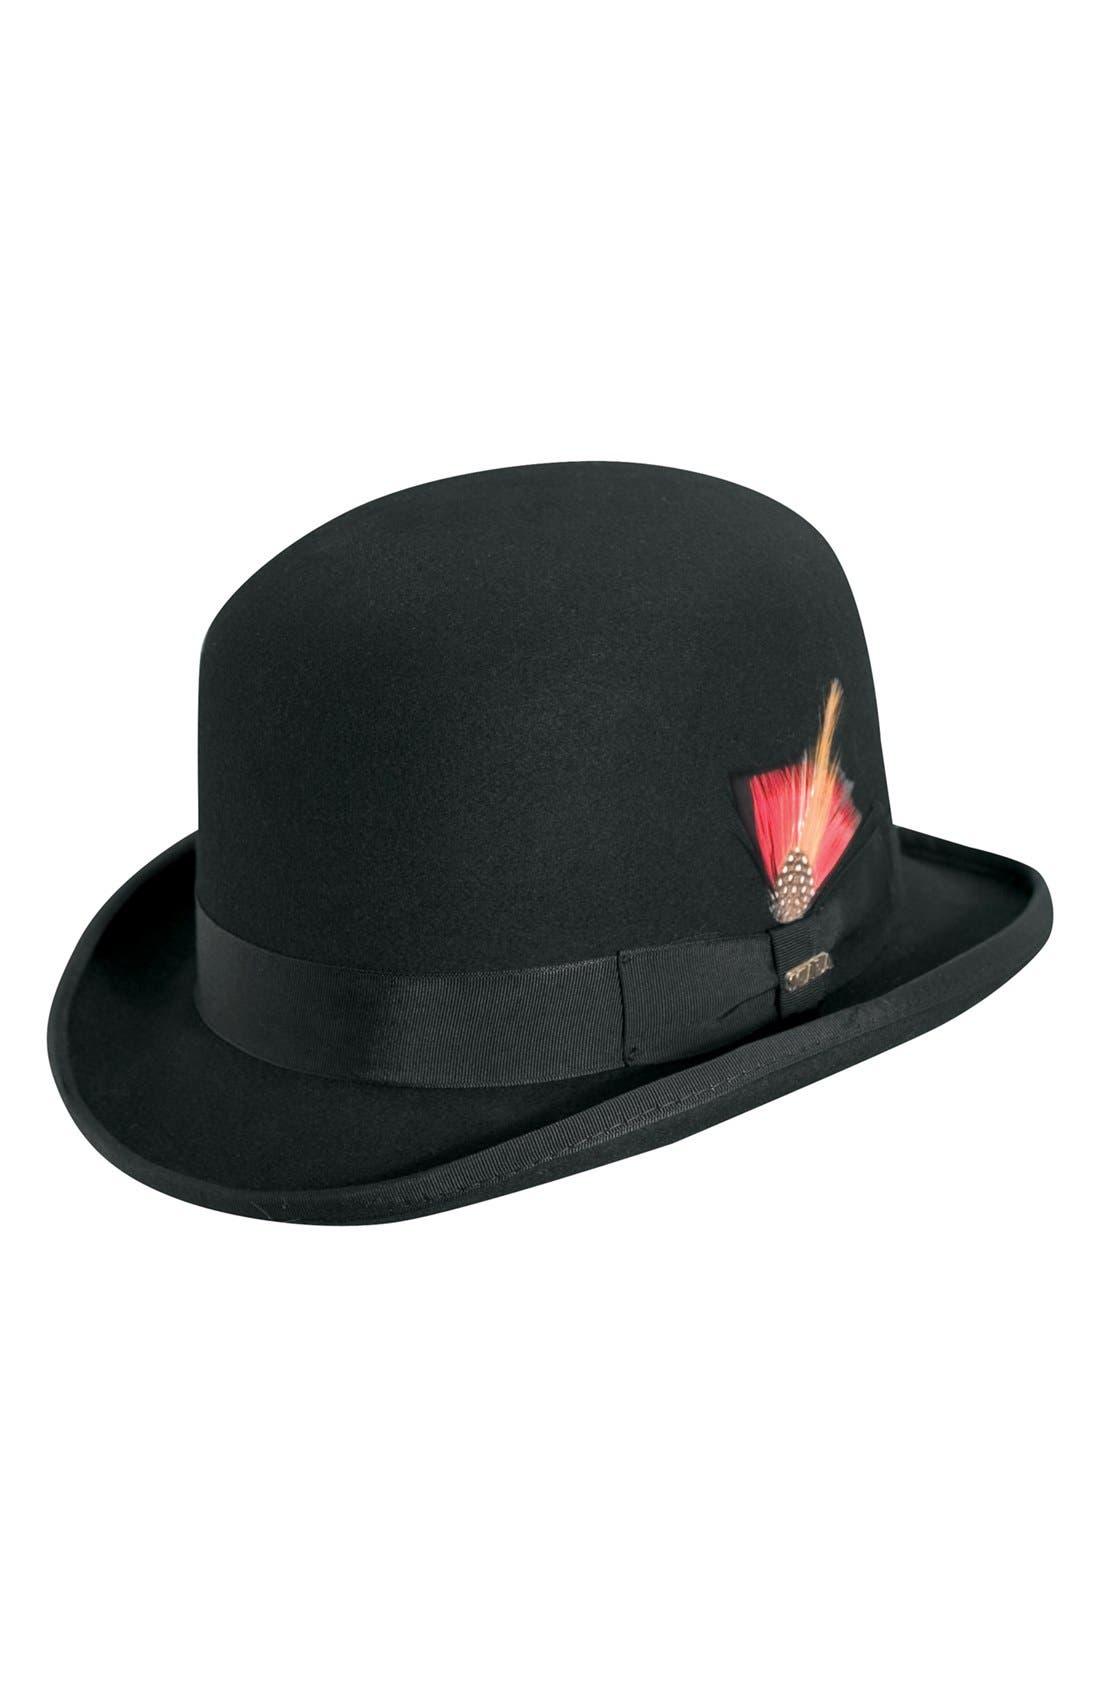 'Classico' Wool Felt Derby Hat,                             Main thumbnail 1, color,                             BLACK